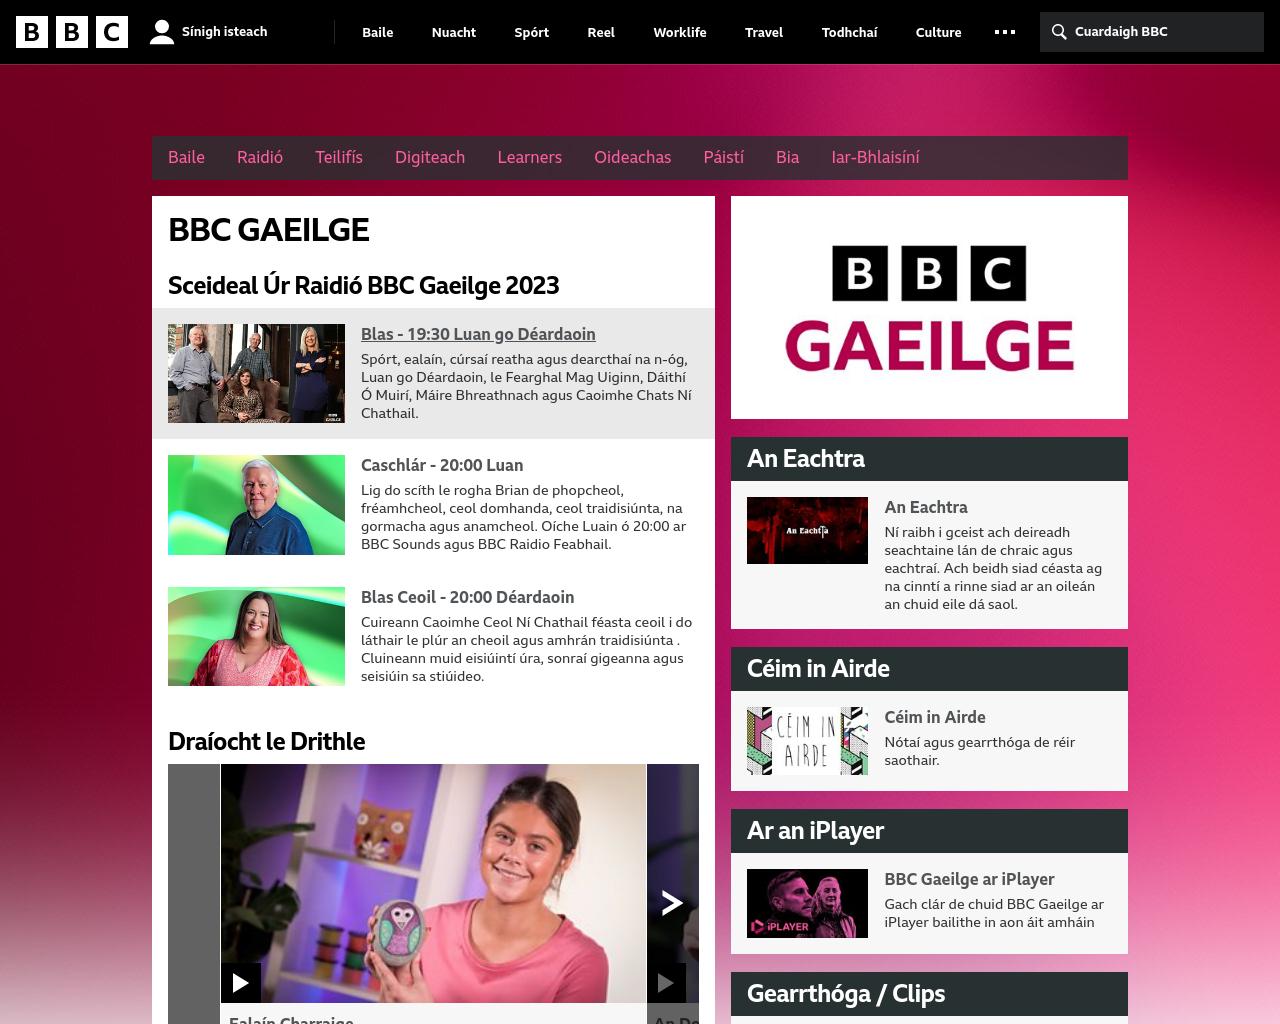 BBC - Gaeilge